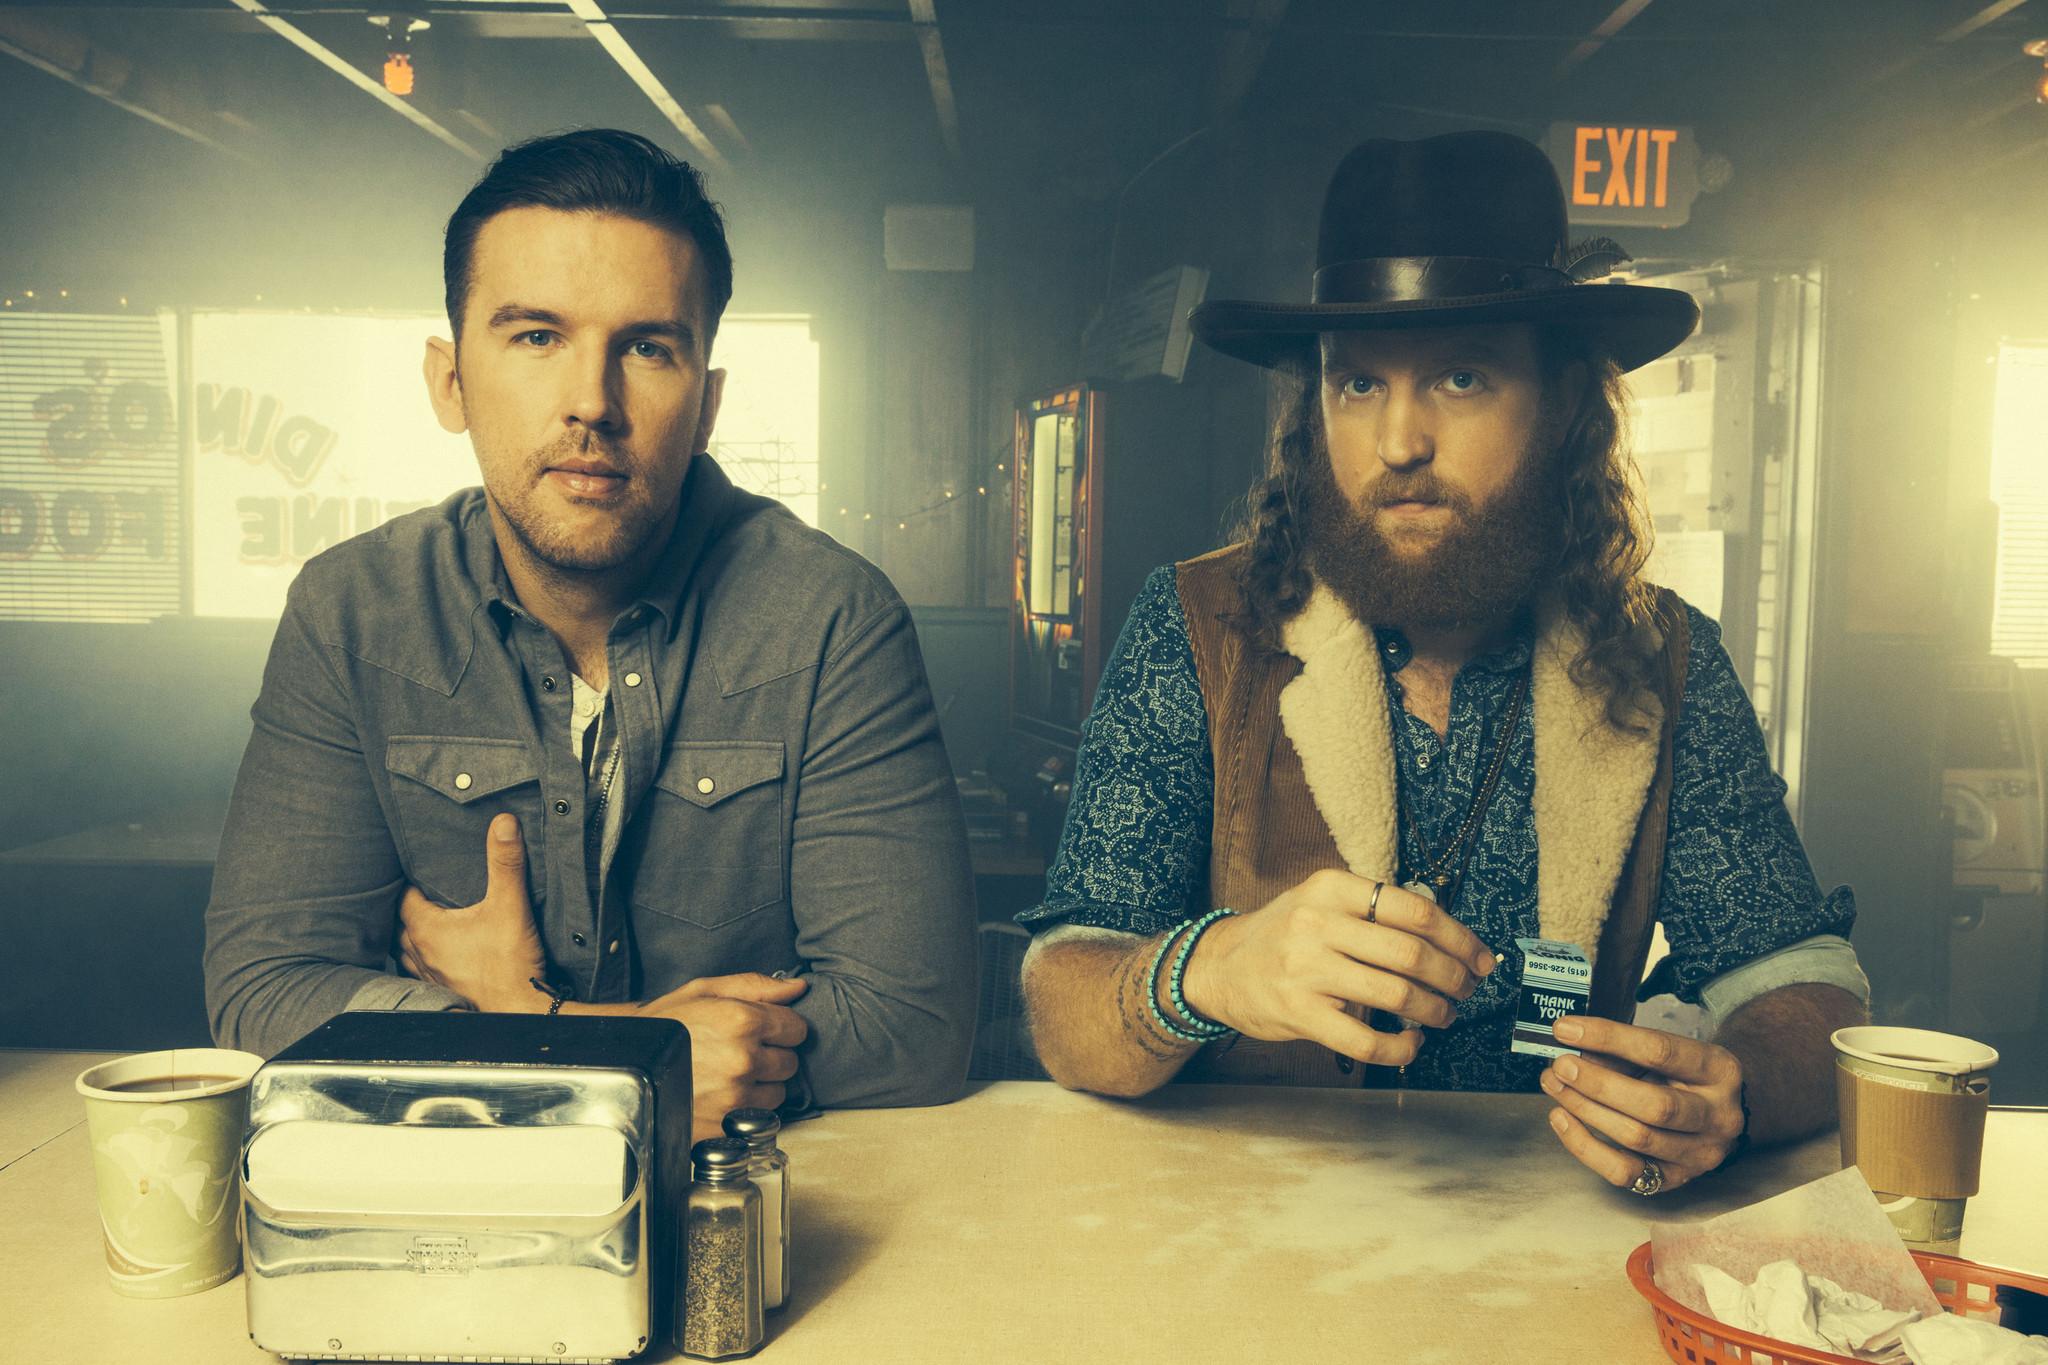 Maryland Natives Brothers Osborne Ready Debut Album Pawn Shop